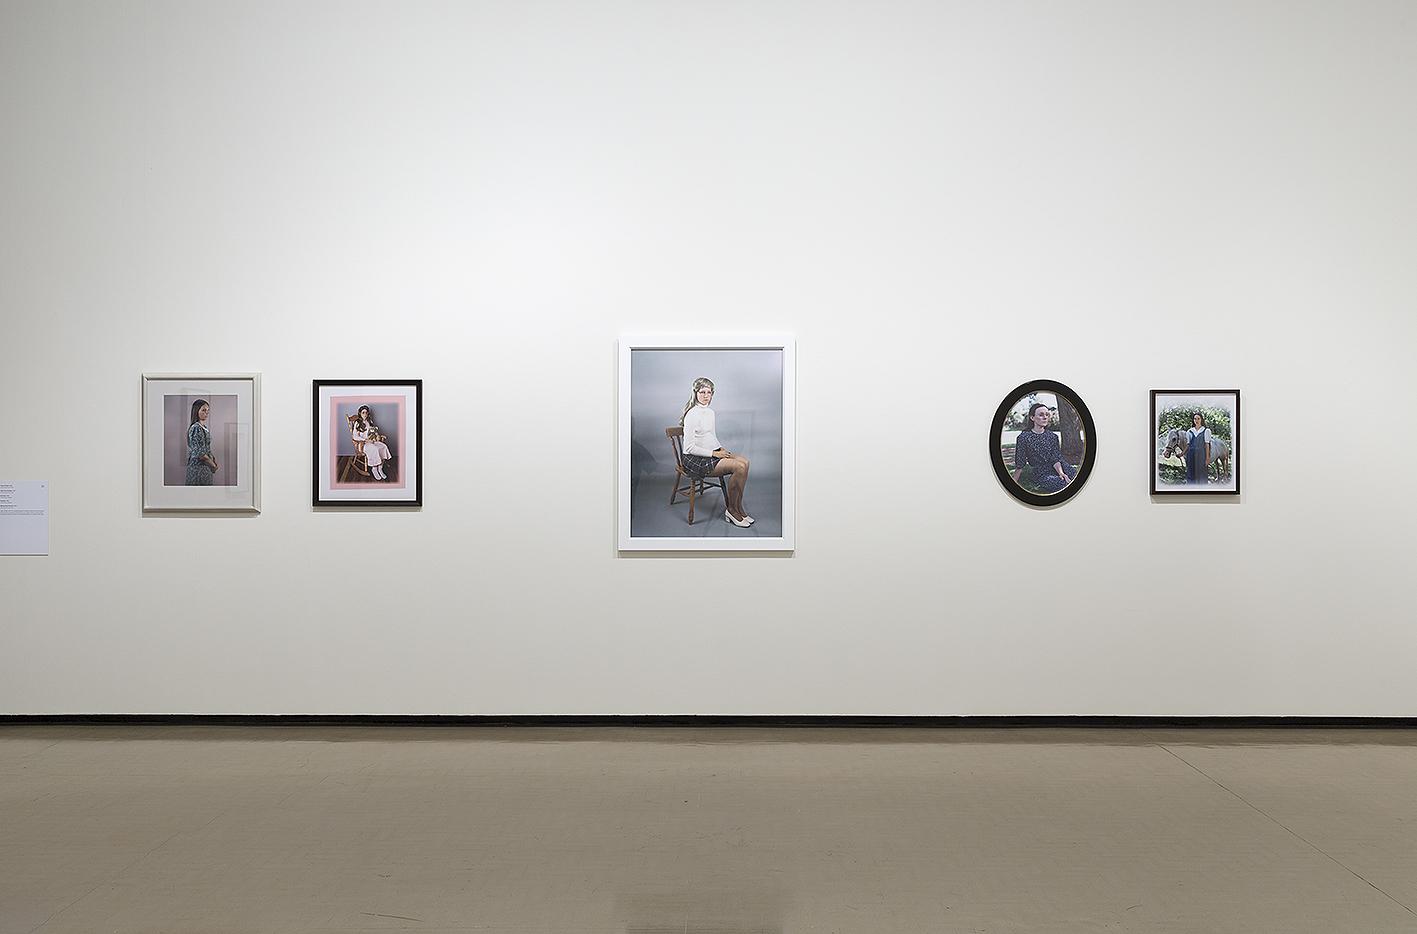 City Gallery_Yvonne Todd_Creamy Psychology_documentation_hiRez_010.jpg